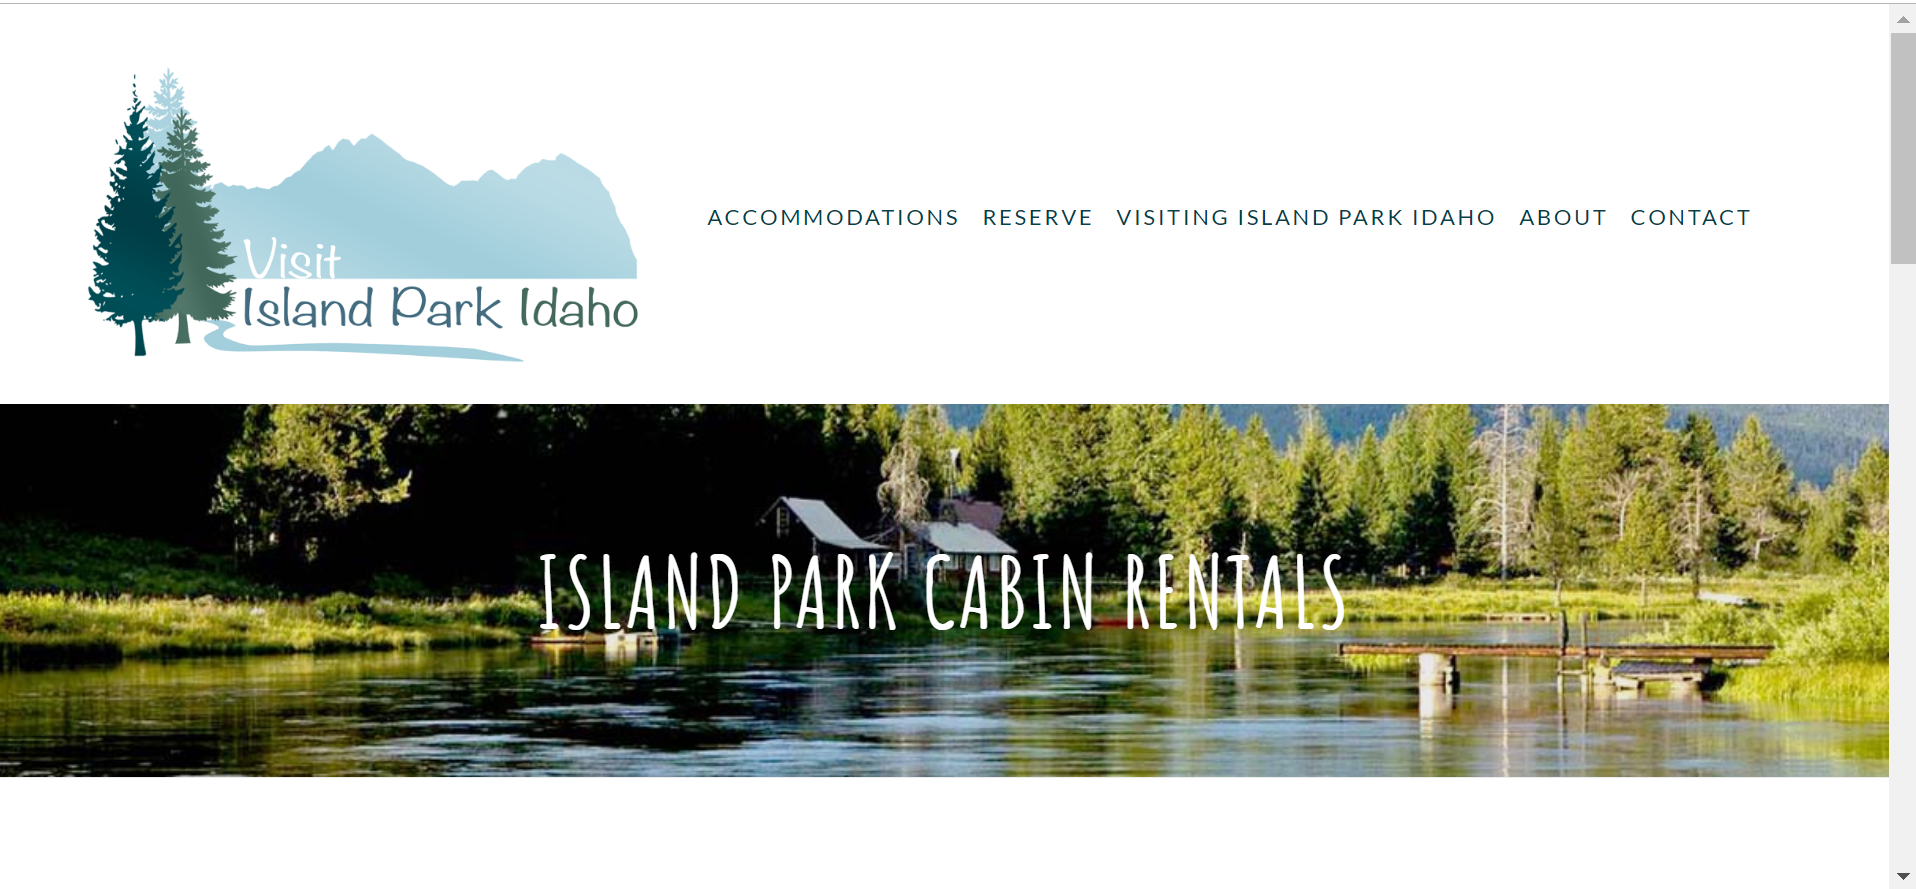 Visit Island Park Idaho - VACATION RENTALS